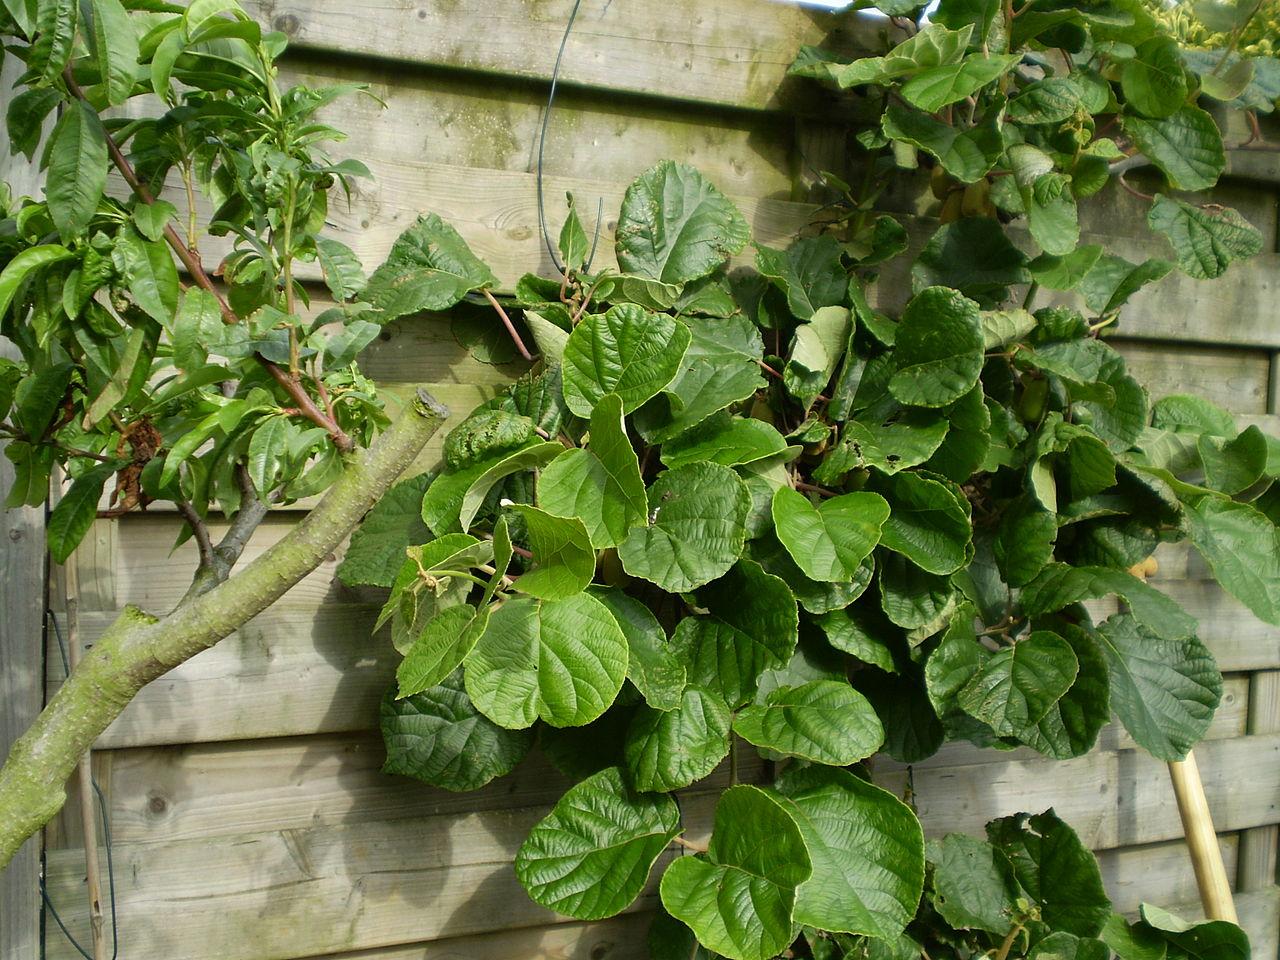 planta de kiwi macho y hembra, diferenciar kiwi macho y kiwi hembra